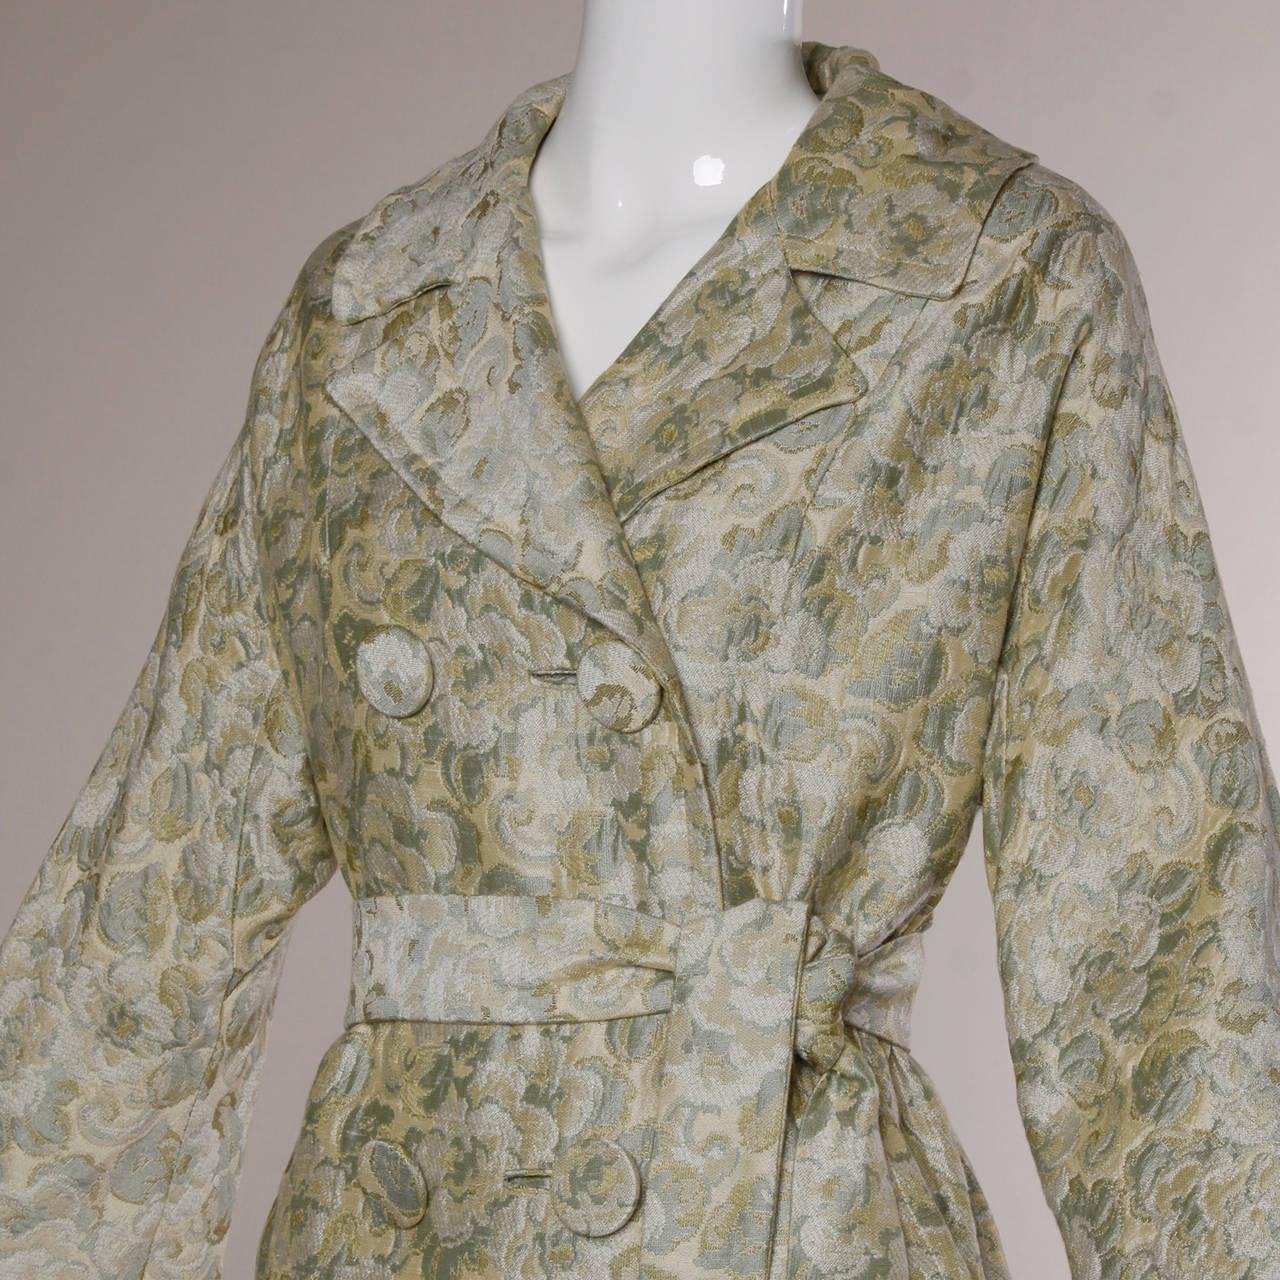 Joseph Magnin 1960s Vintage Metallic Brocade Tapestry Trench Coat 3